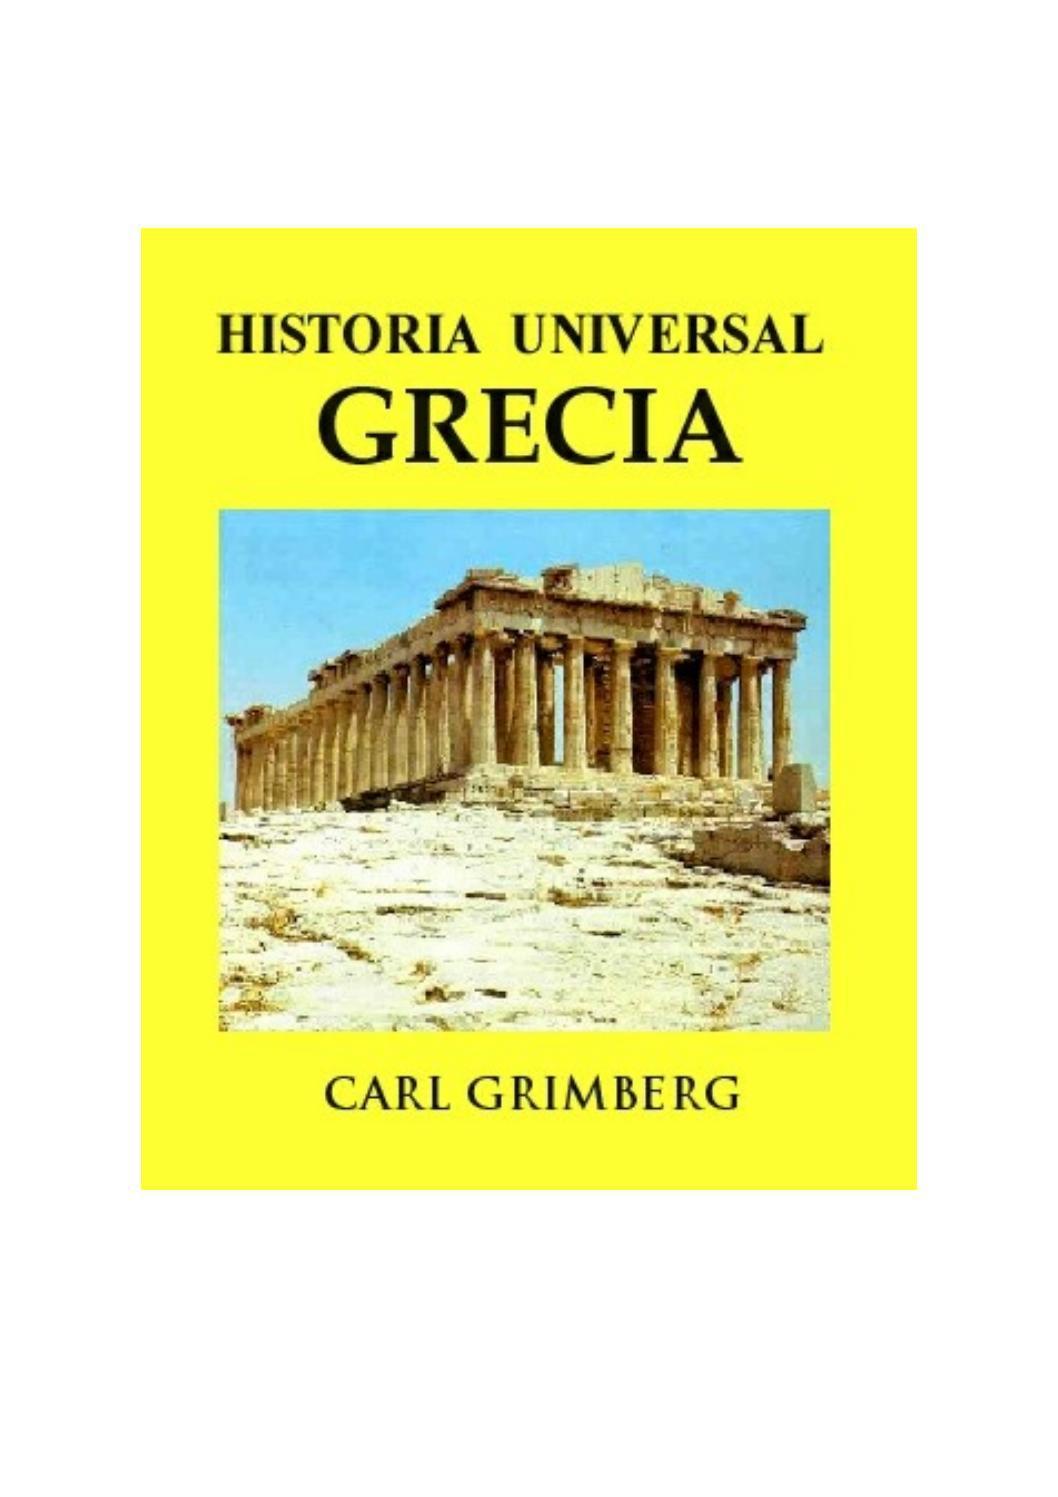 carl grimberg historia universal tomo ii pdf